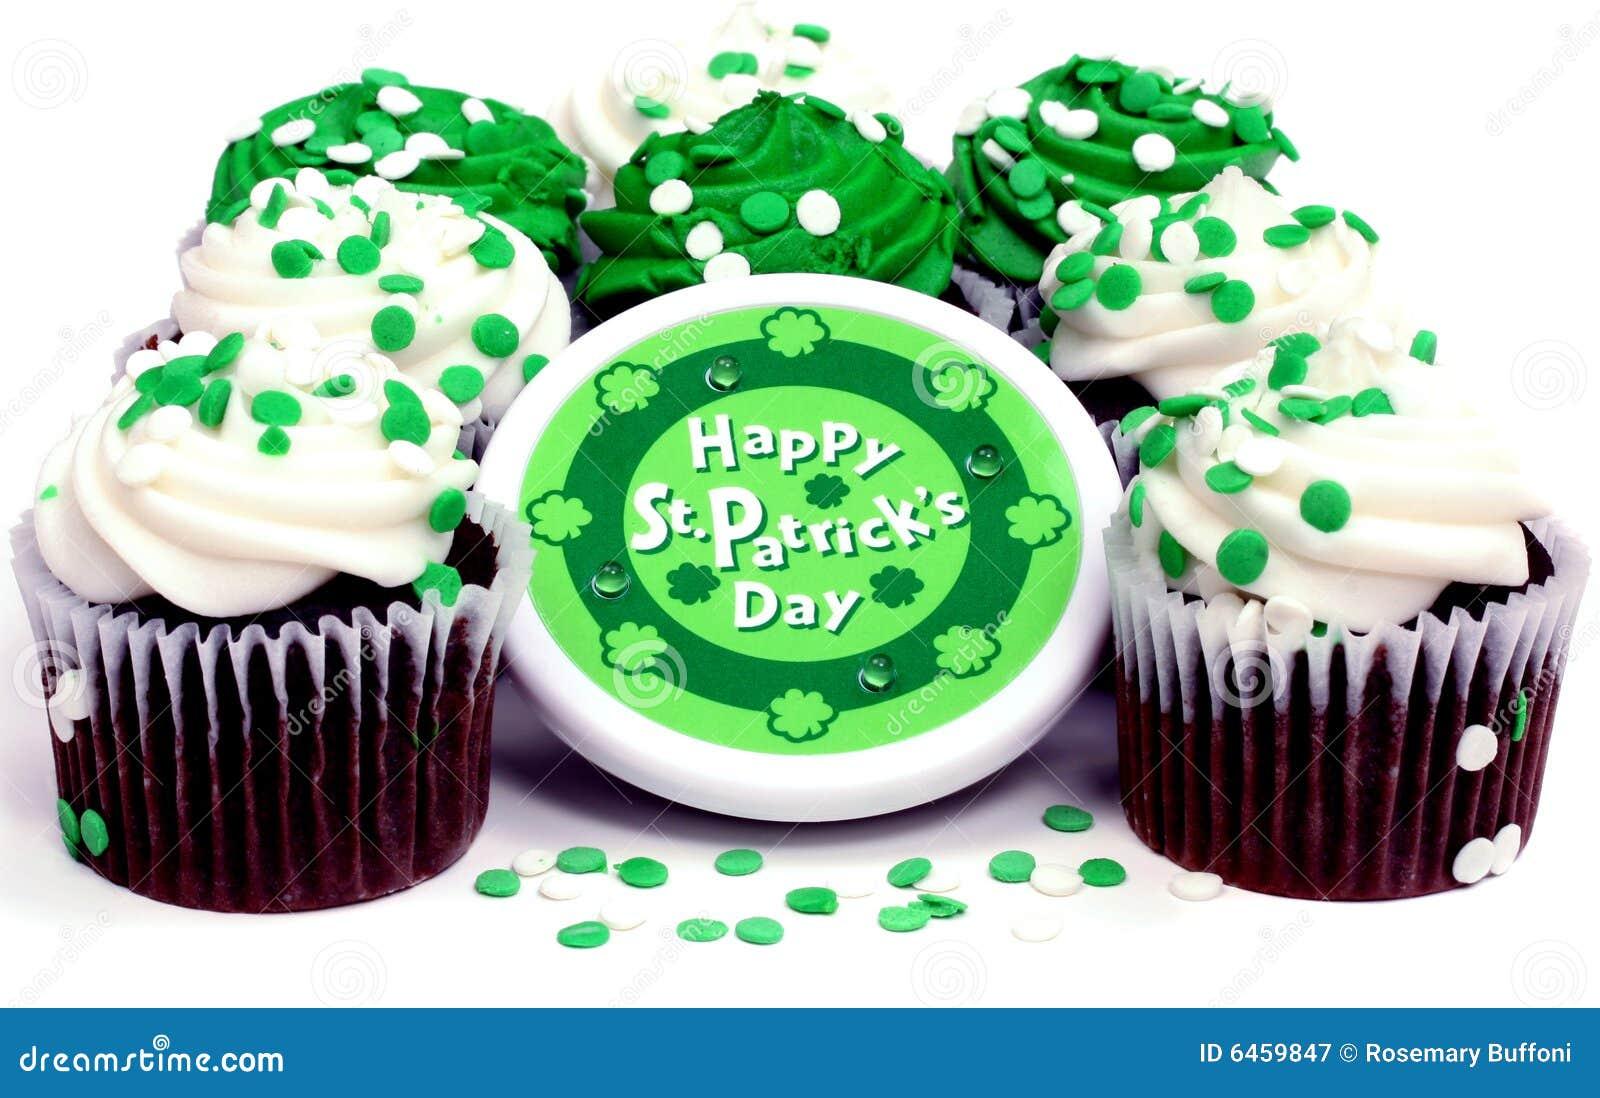 Queques do St. Patrick